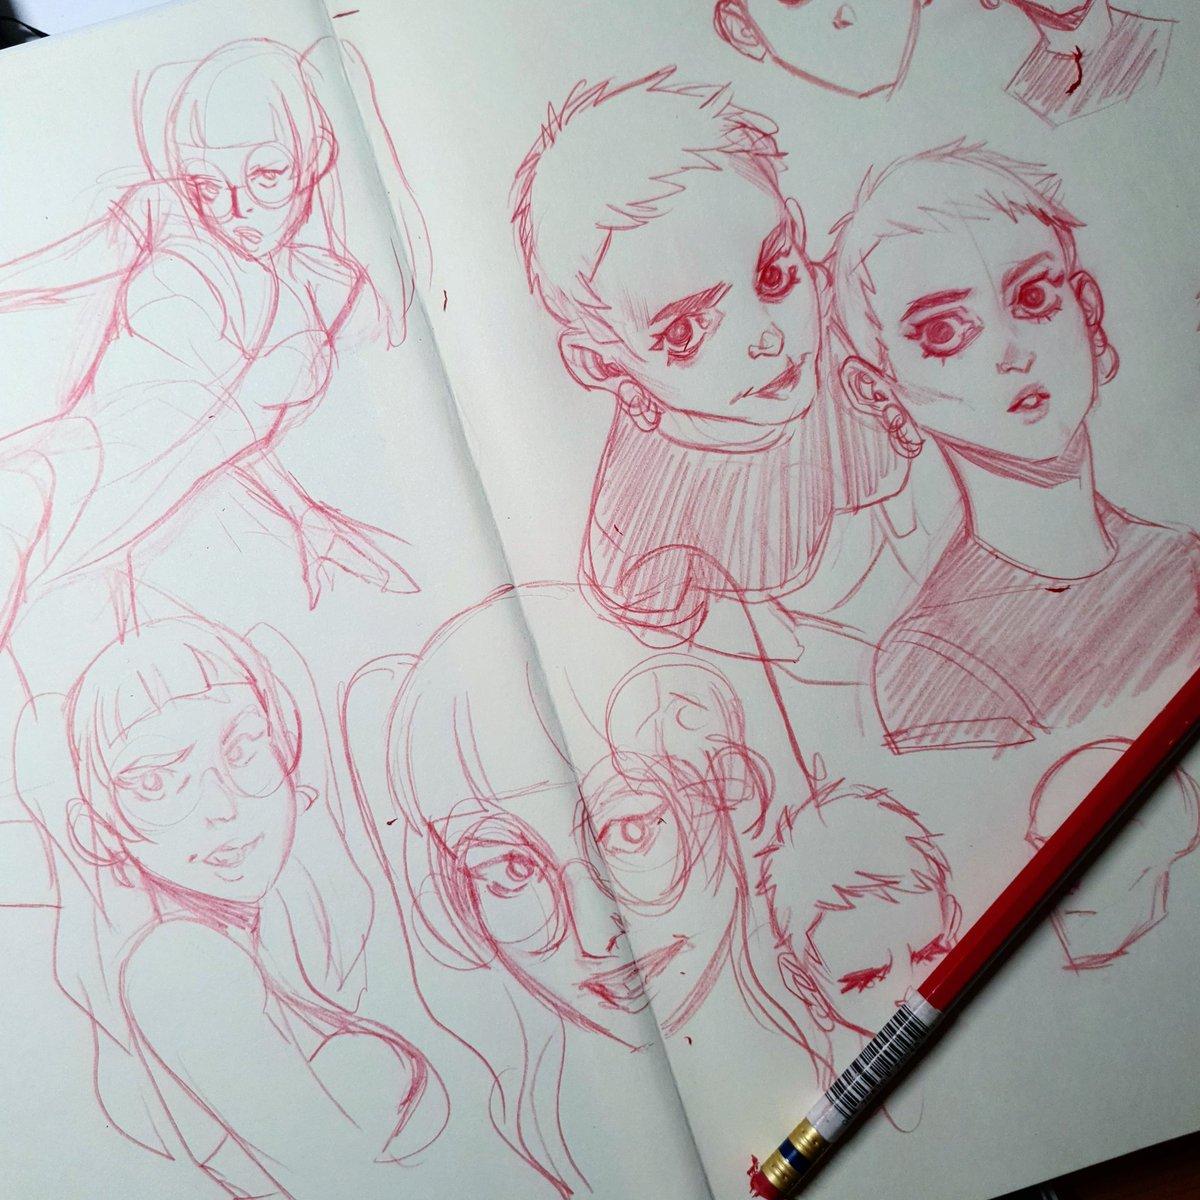 Doodling #doodles #doodle #doodleart #sketches #eloelo #eleonoracarlinipic.twitter.com/nvnJEYBOfm